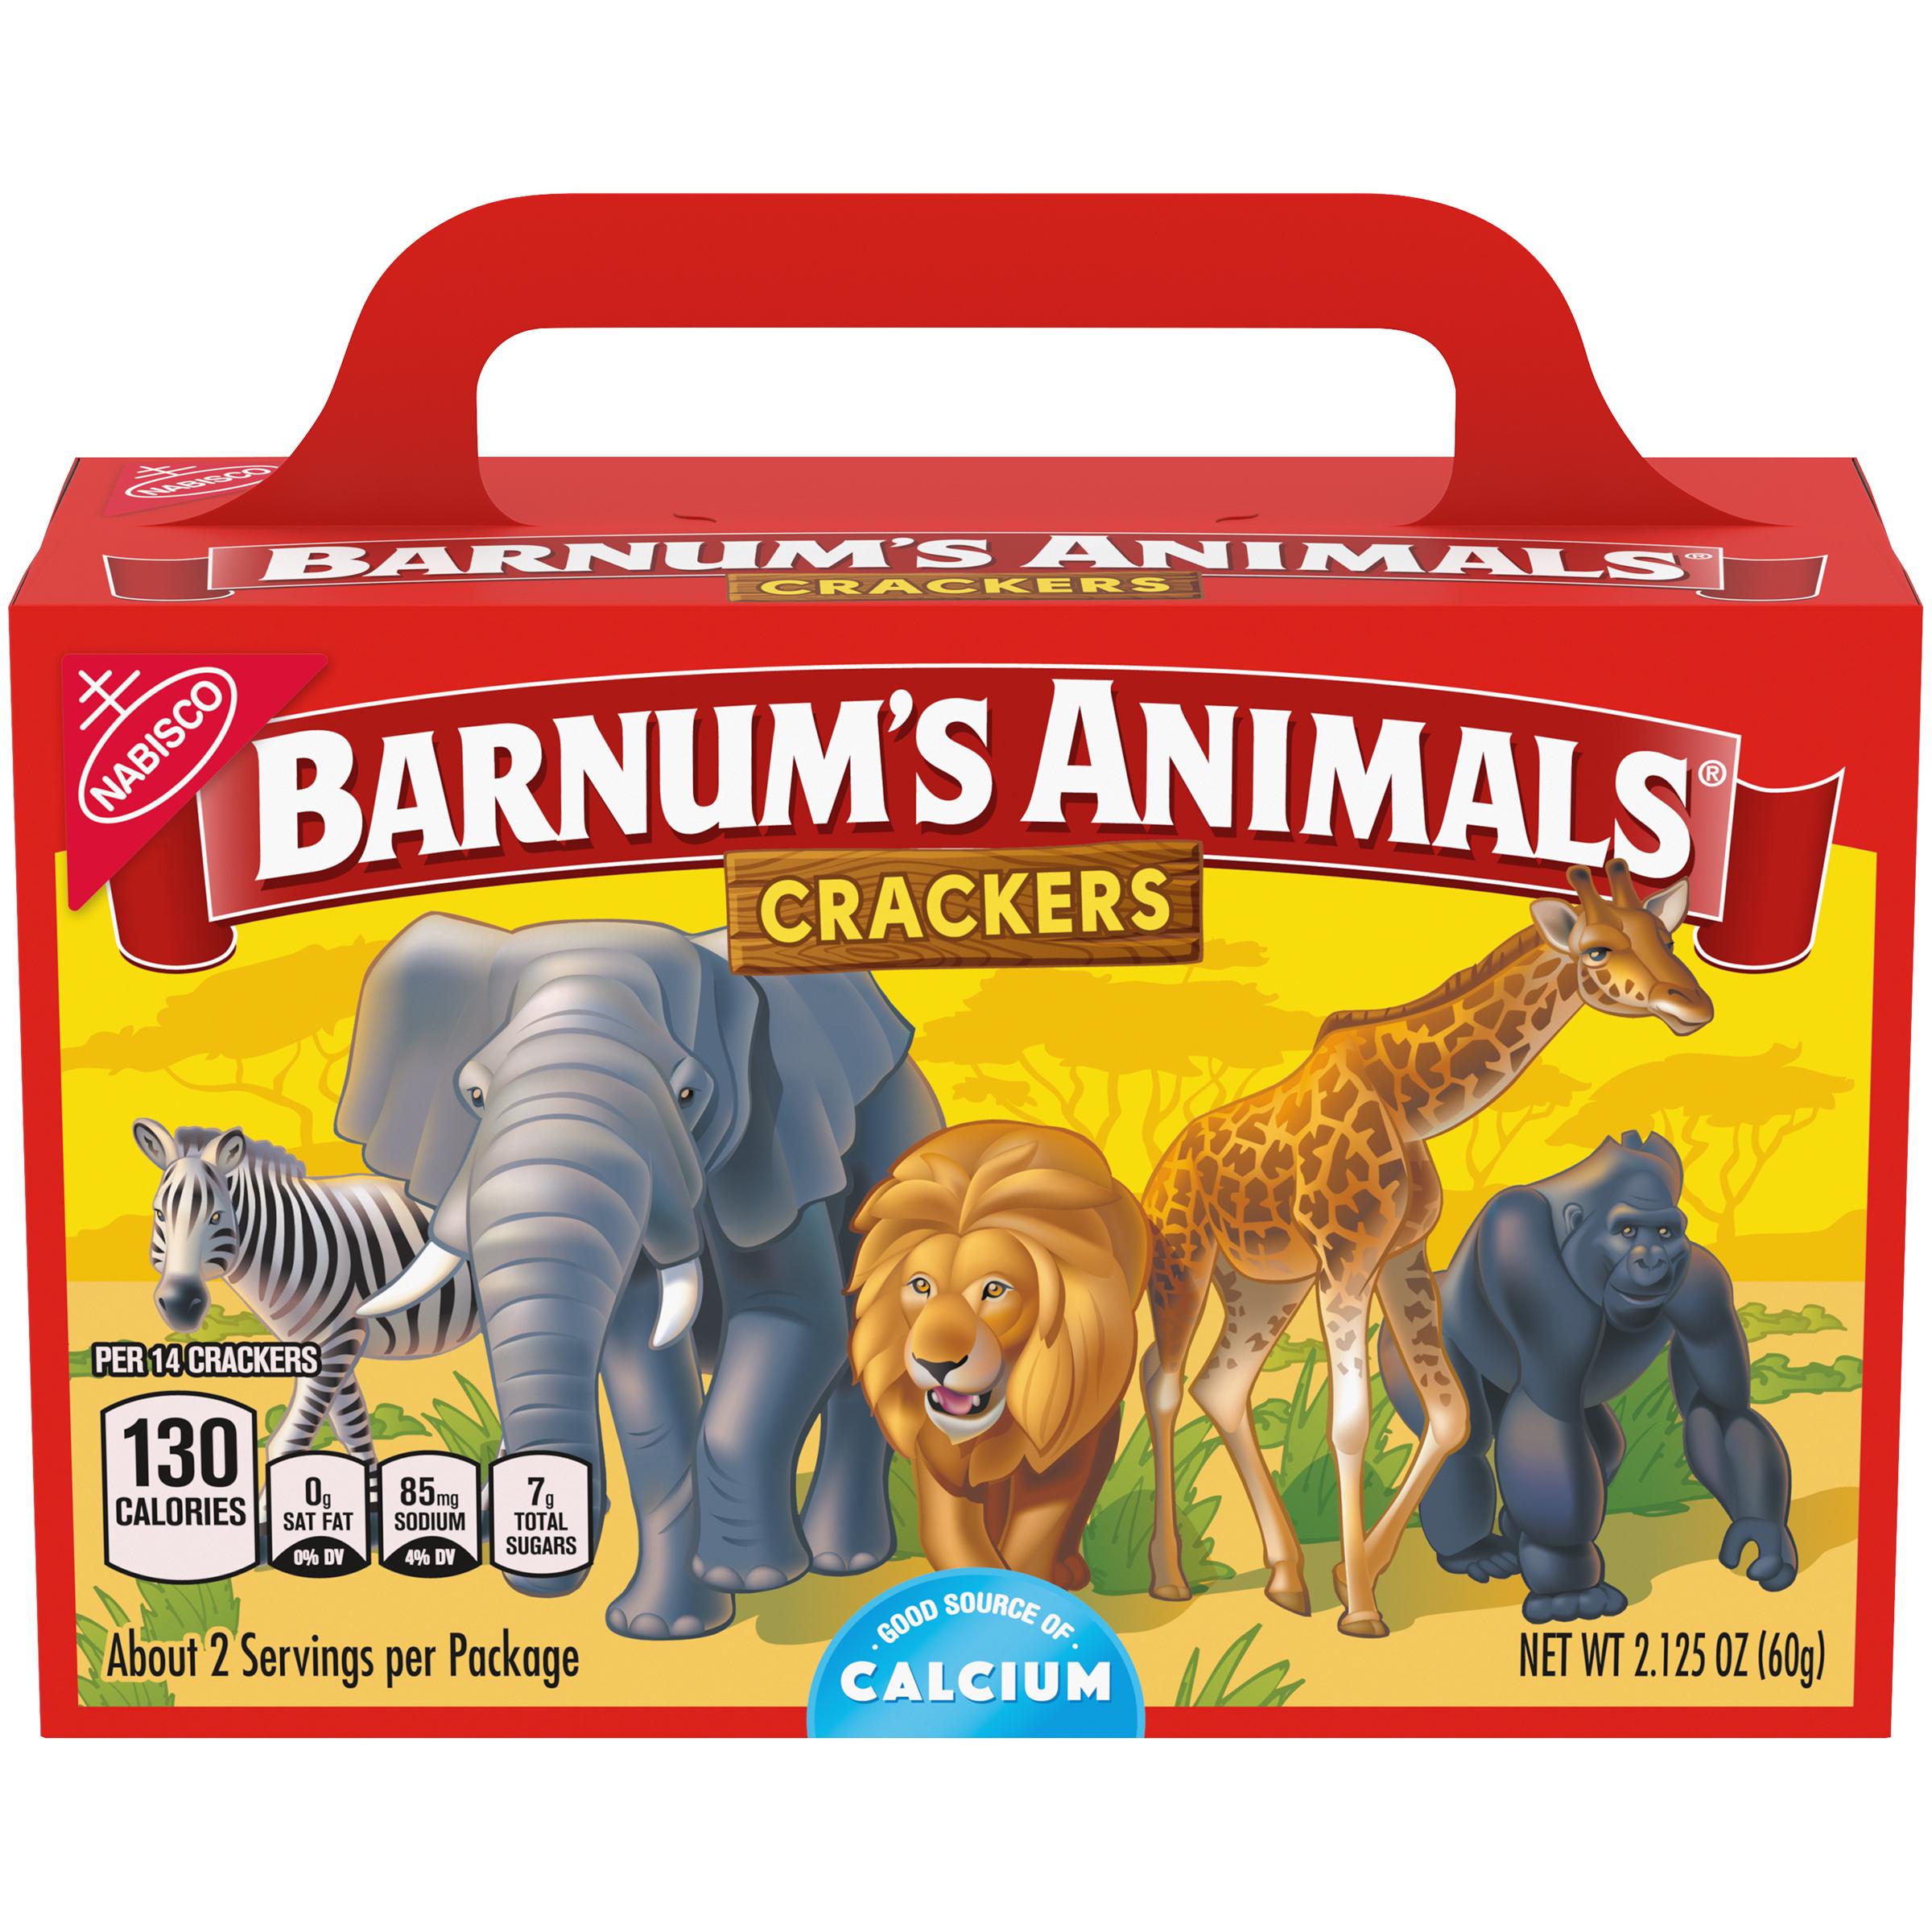 BARNUMS Original Animal Crackers 2.13 oz